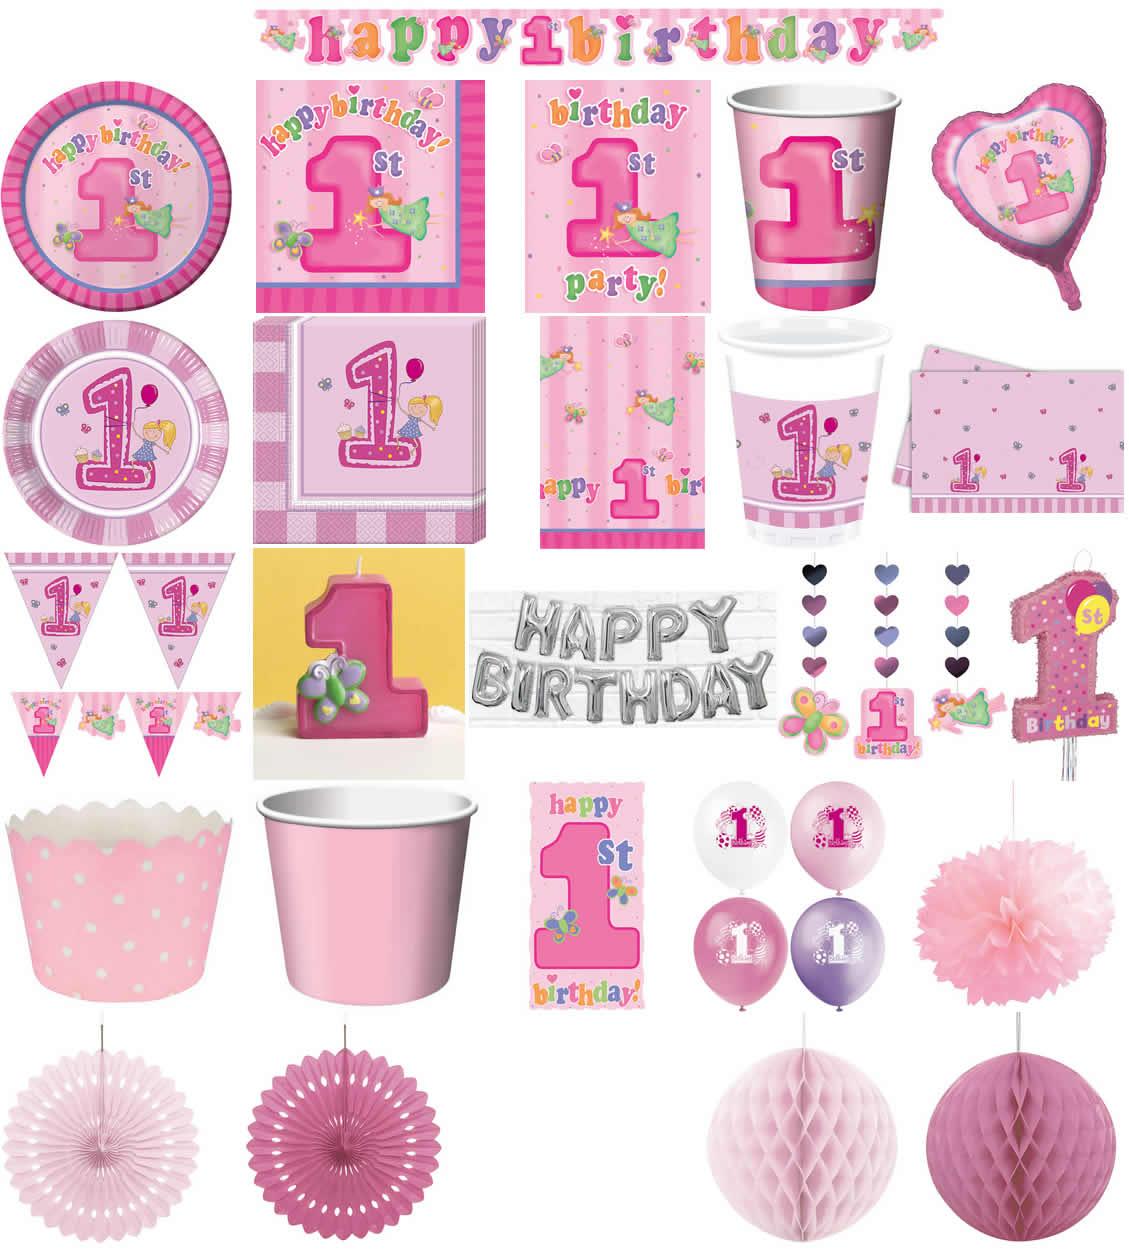 Kindergeburtstag Geburtstag Party Fete Feier Motto 1 Geburtstag